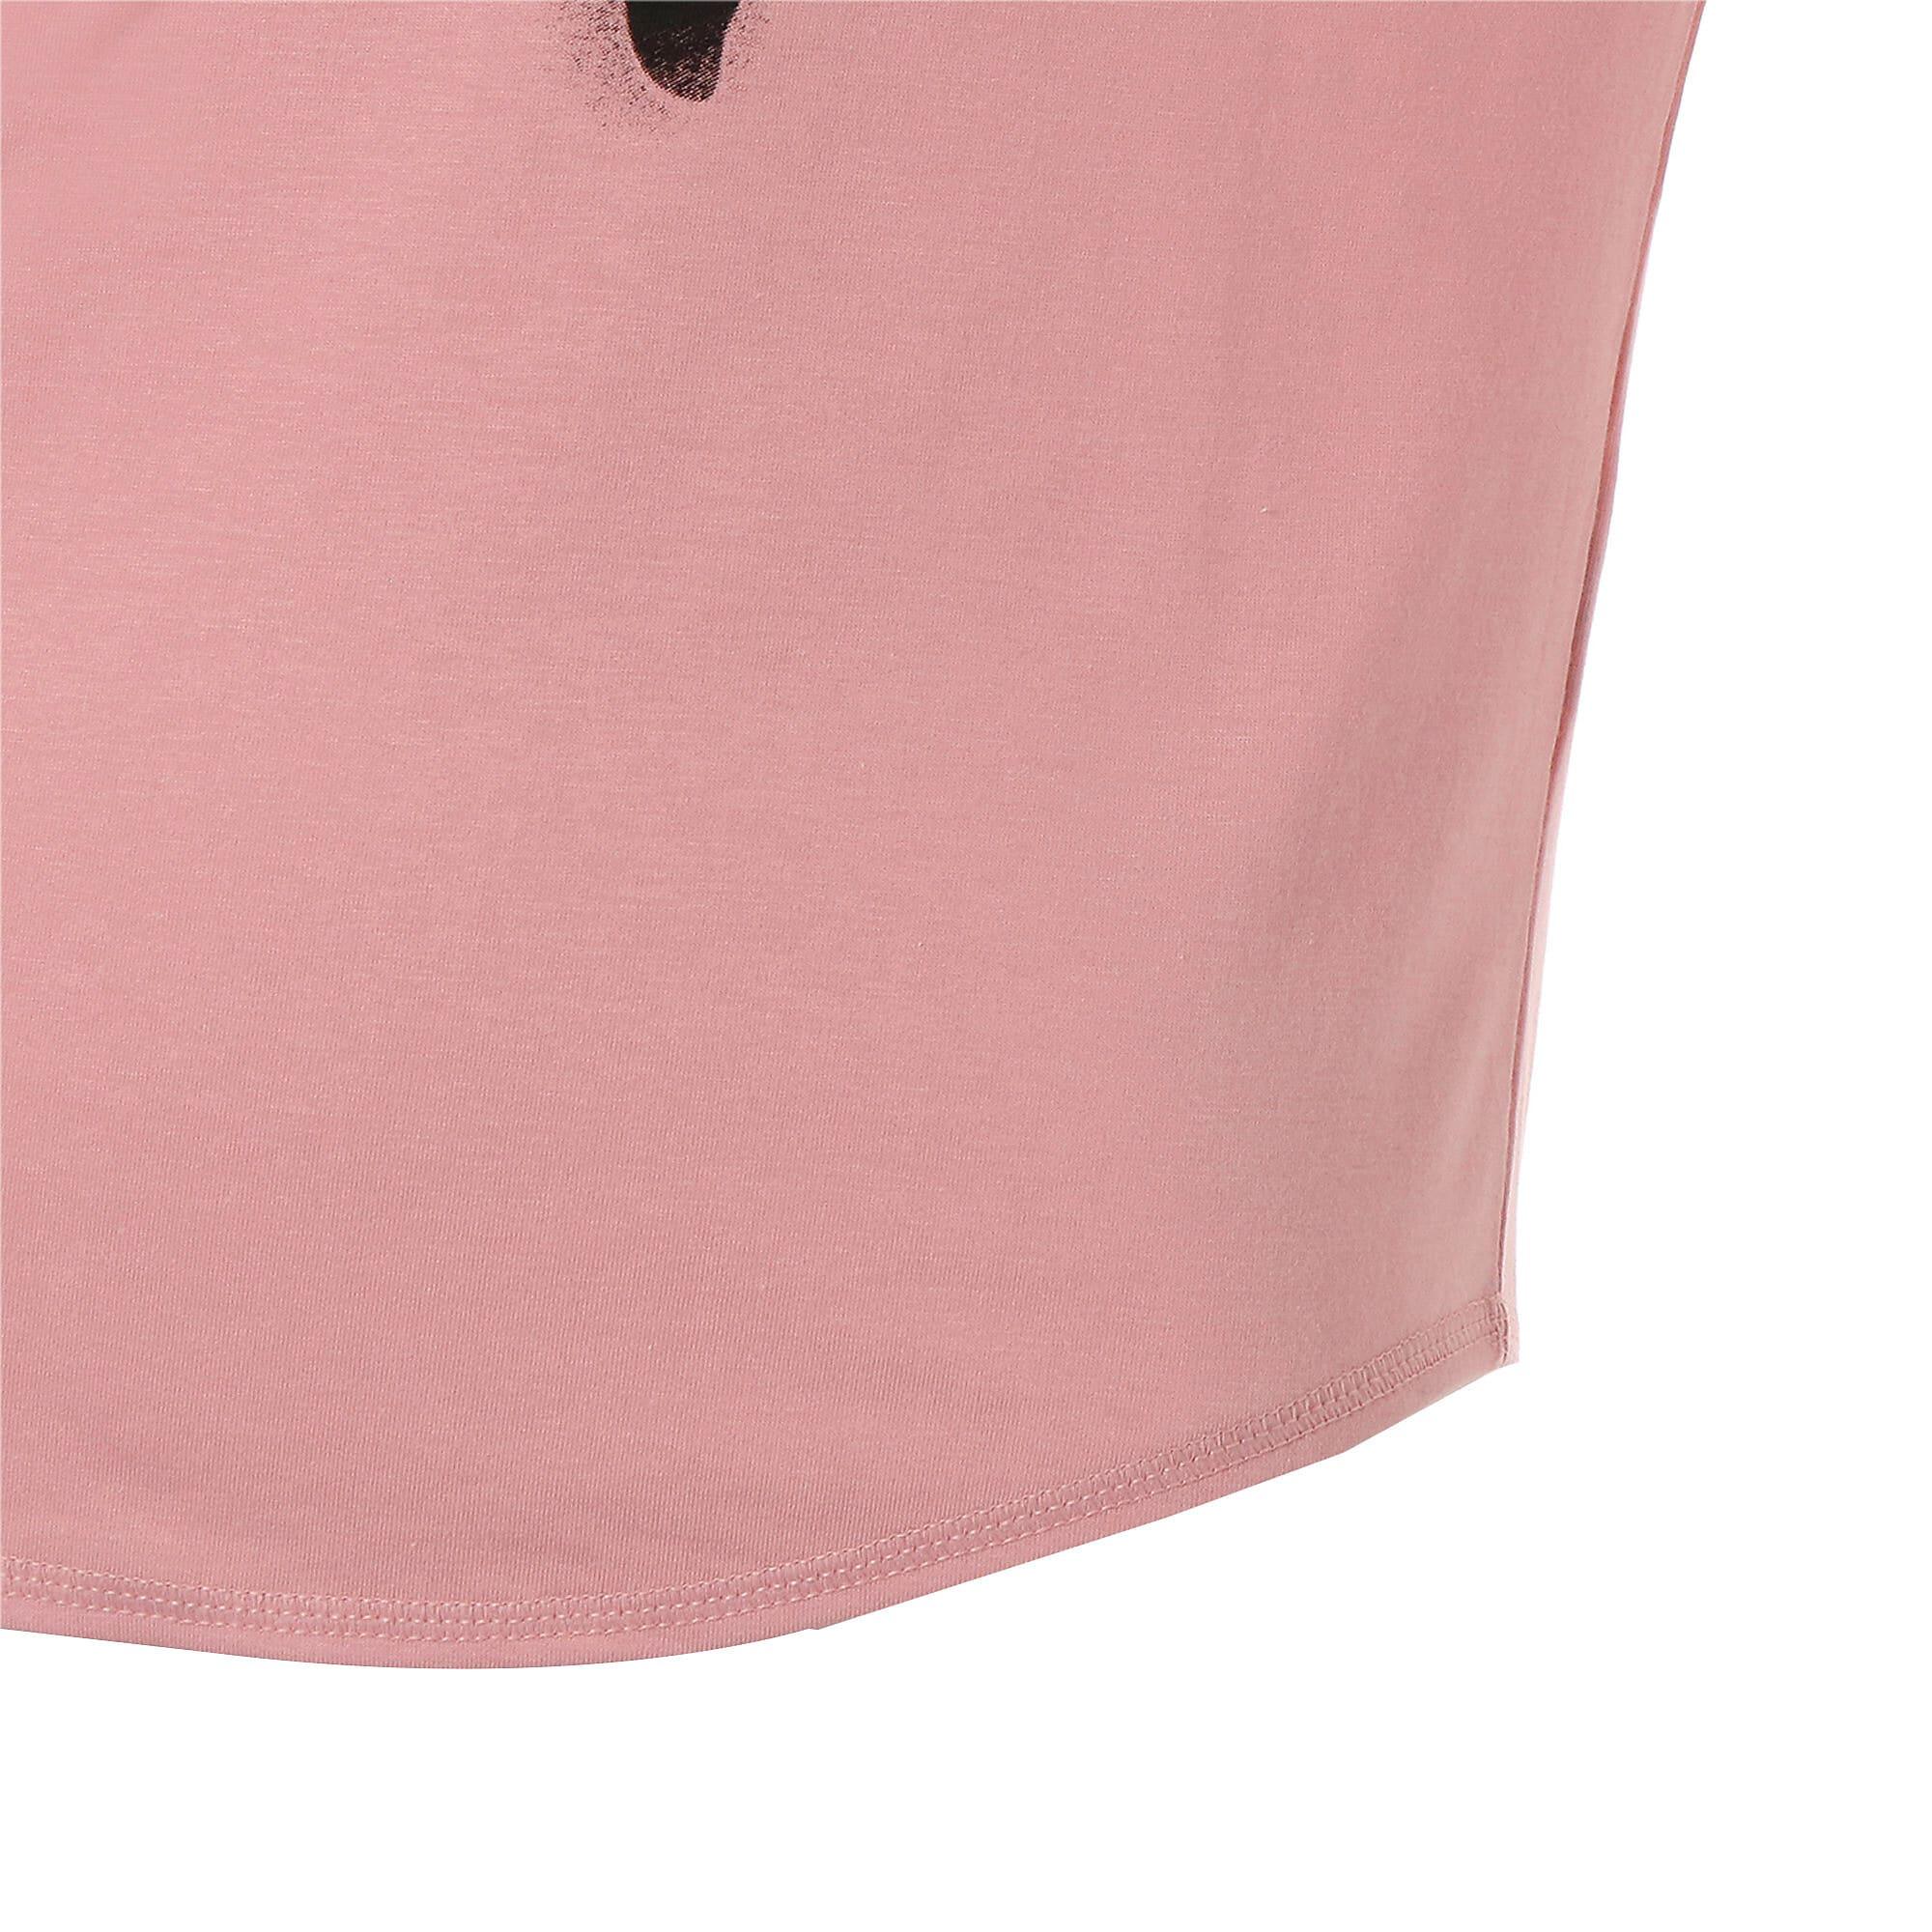 Thumbnail 9 of スタジオ SS ウィメンズ トレーニング メッシュ キャット Tシャツ 半袖, Bridal Rose, medium-JPN